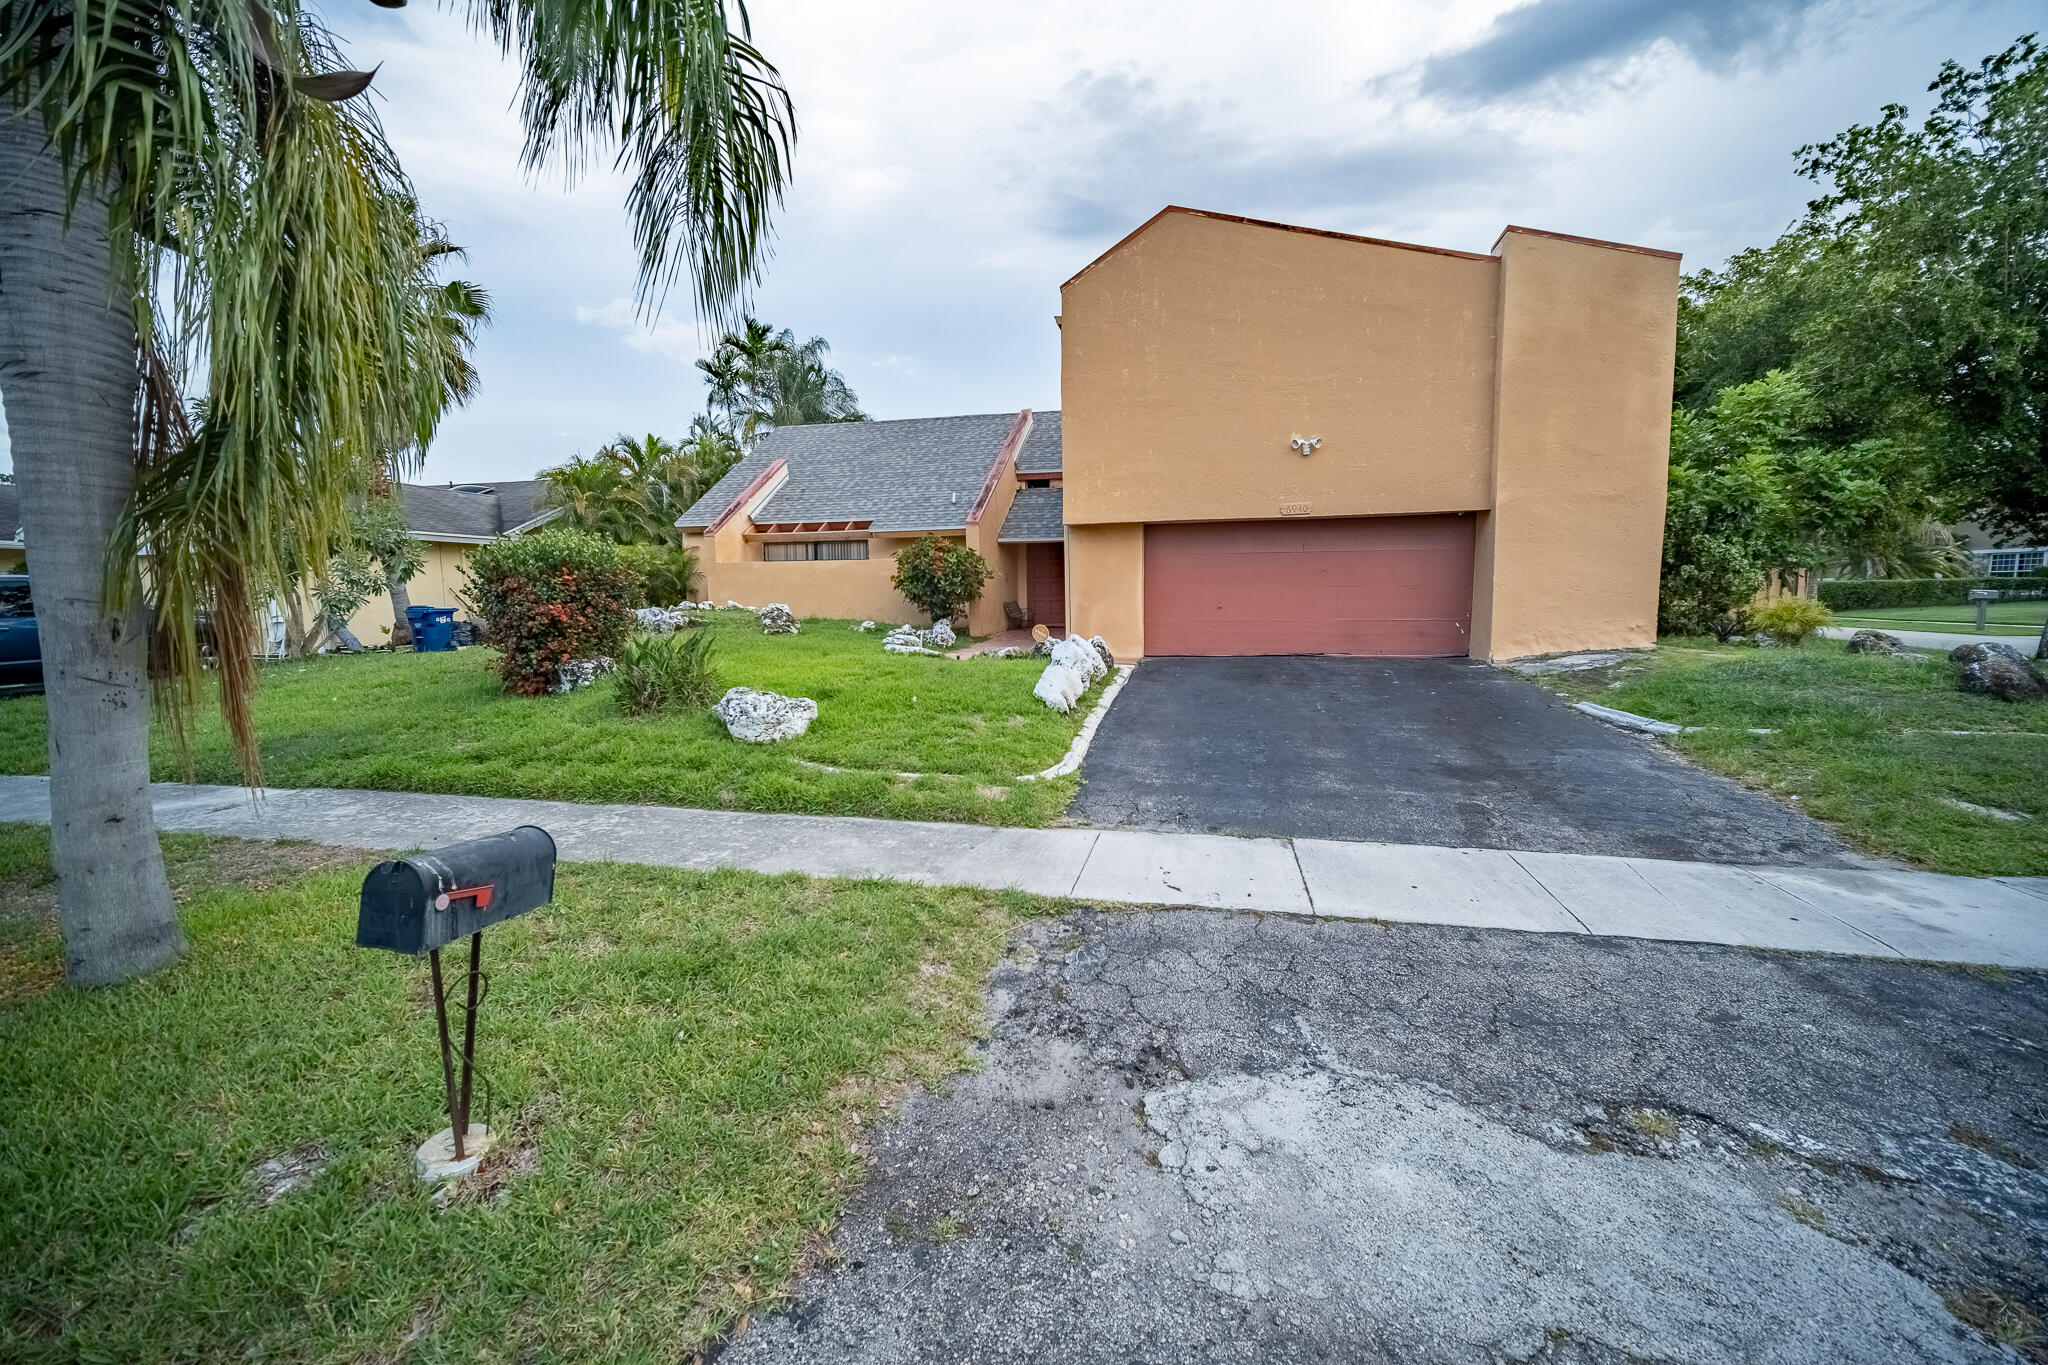 Details for 6940 45 St Nw, Lauderhill, FL 33319